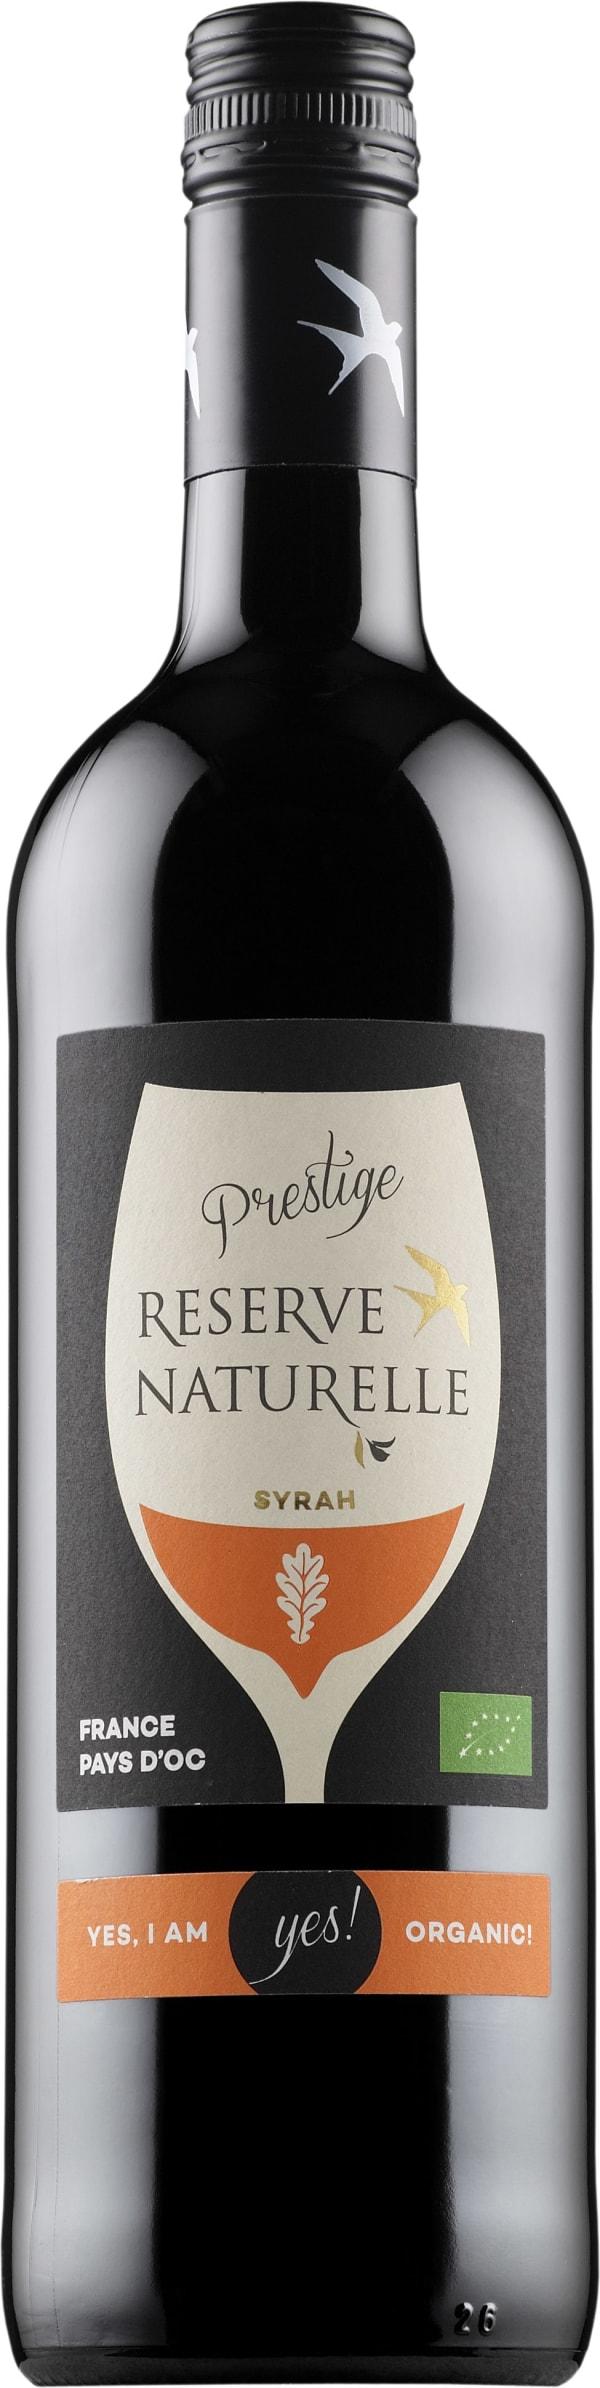 Reserve Naturelle Prestige Syrah 2015